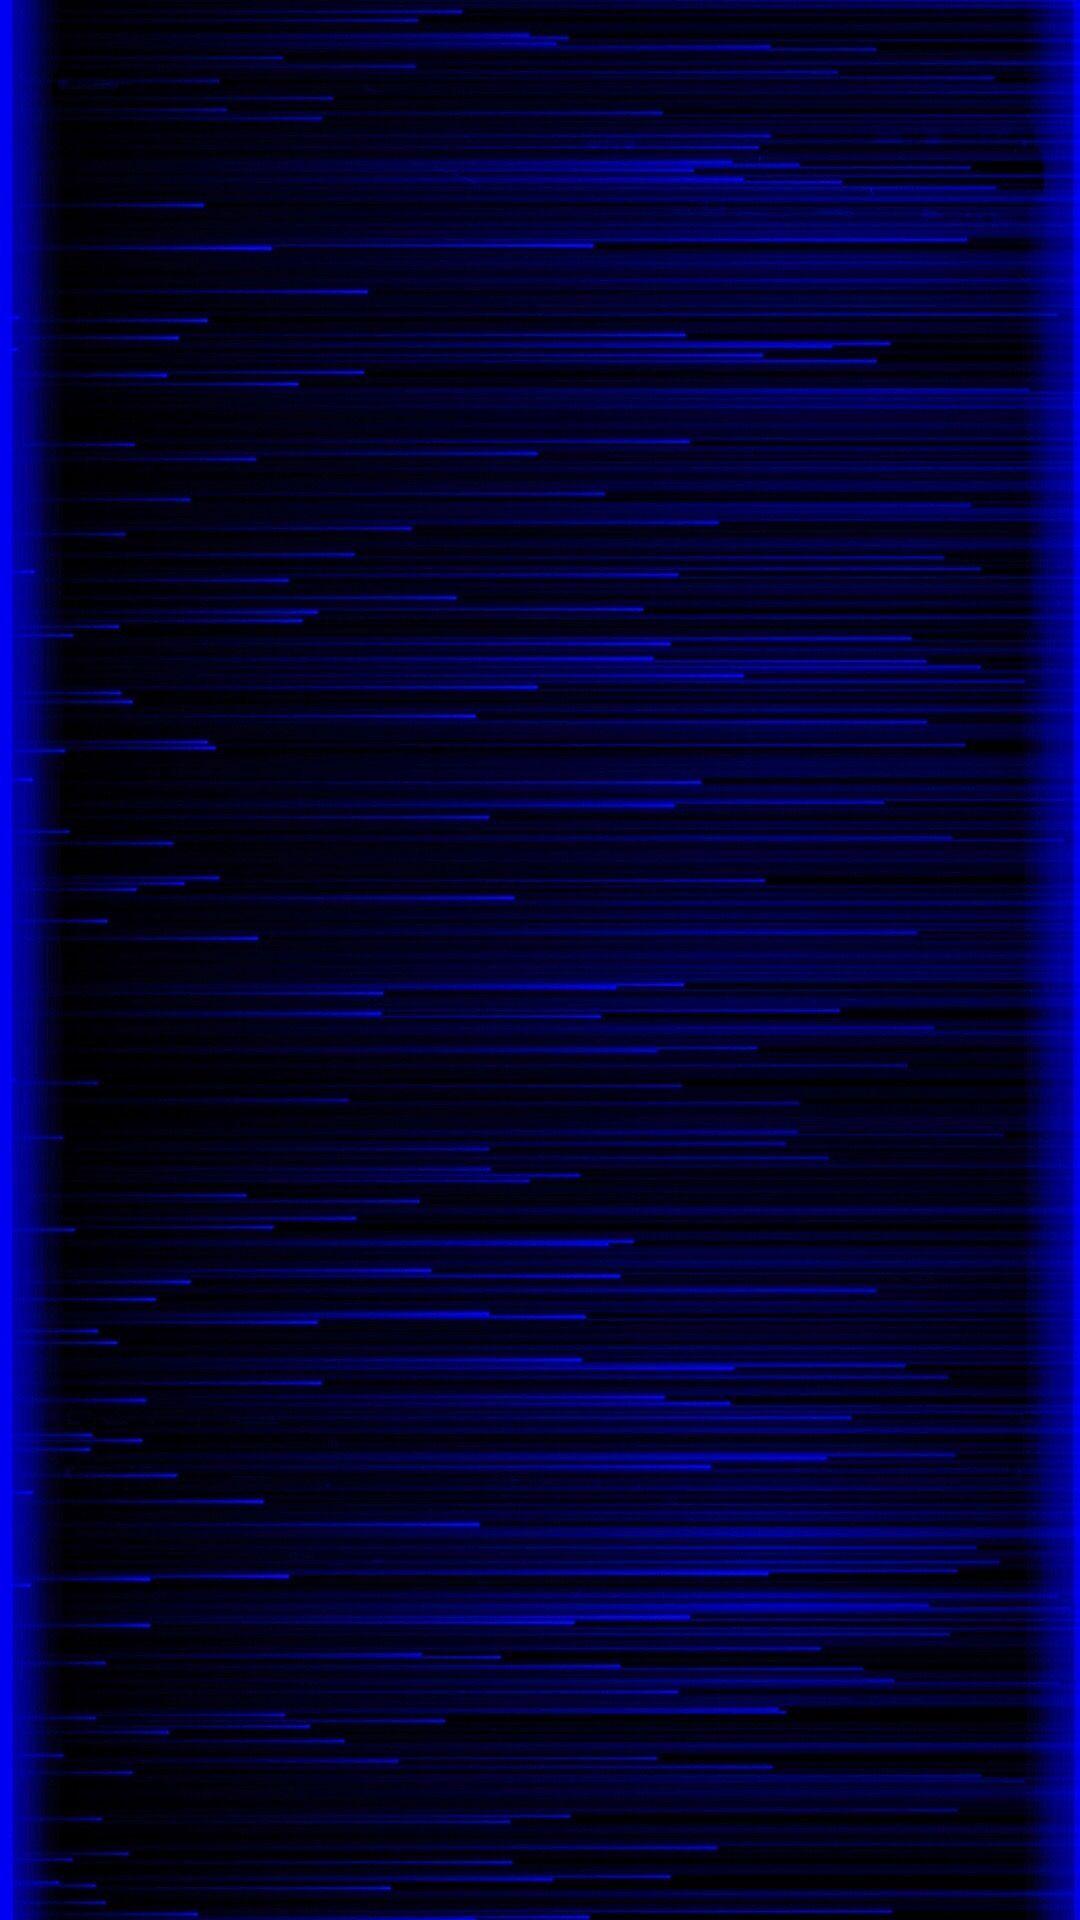 Samsung Wallpaper A10 Hintergrundbild Tapete Phone Wallpaper Hd In 2020 Samsung Wallpaper Nature Iphone Wallpaper Black Phone Wallpaper